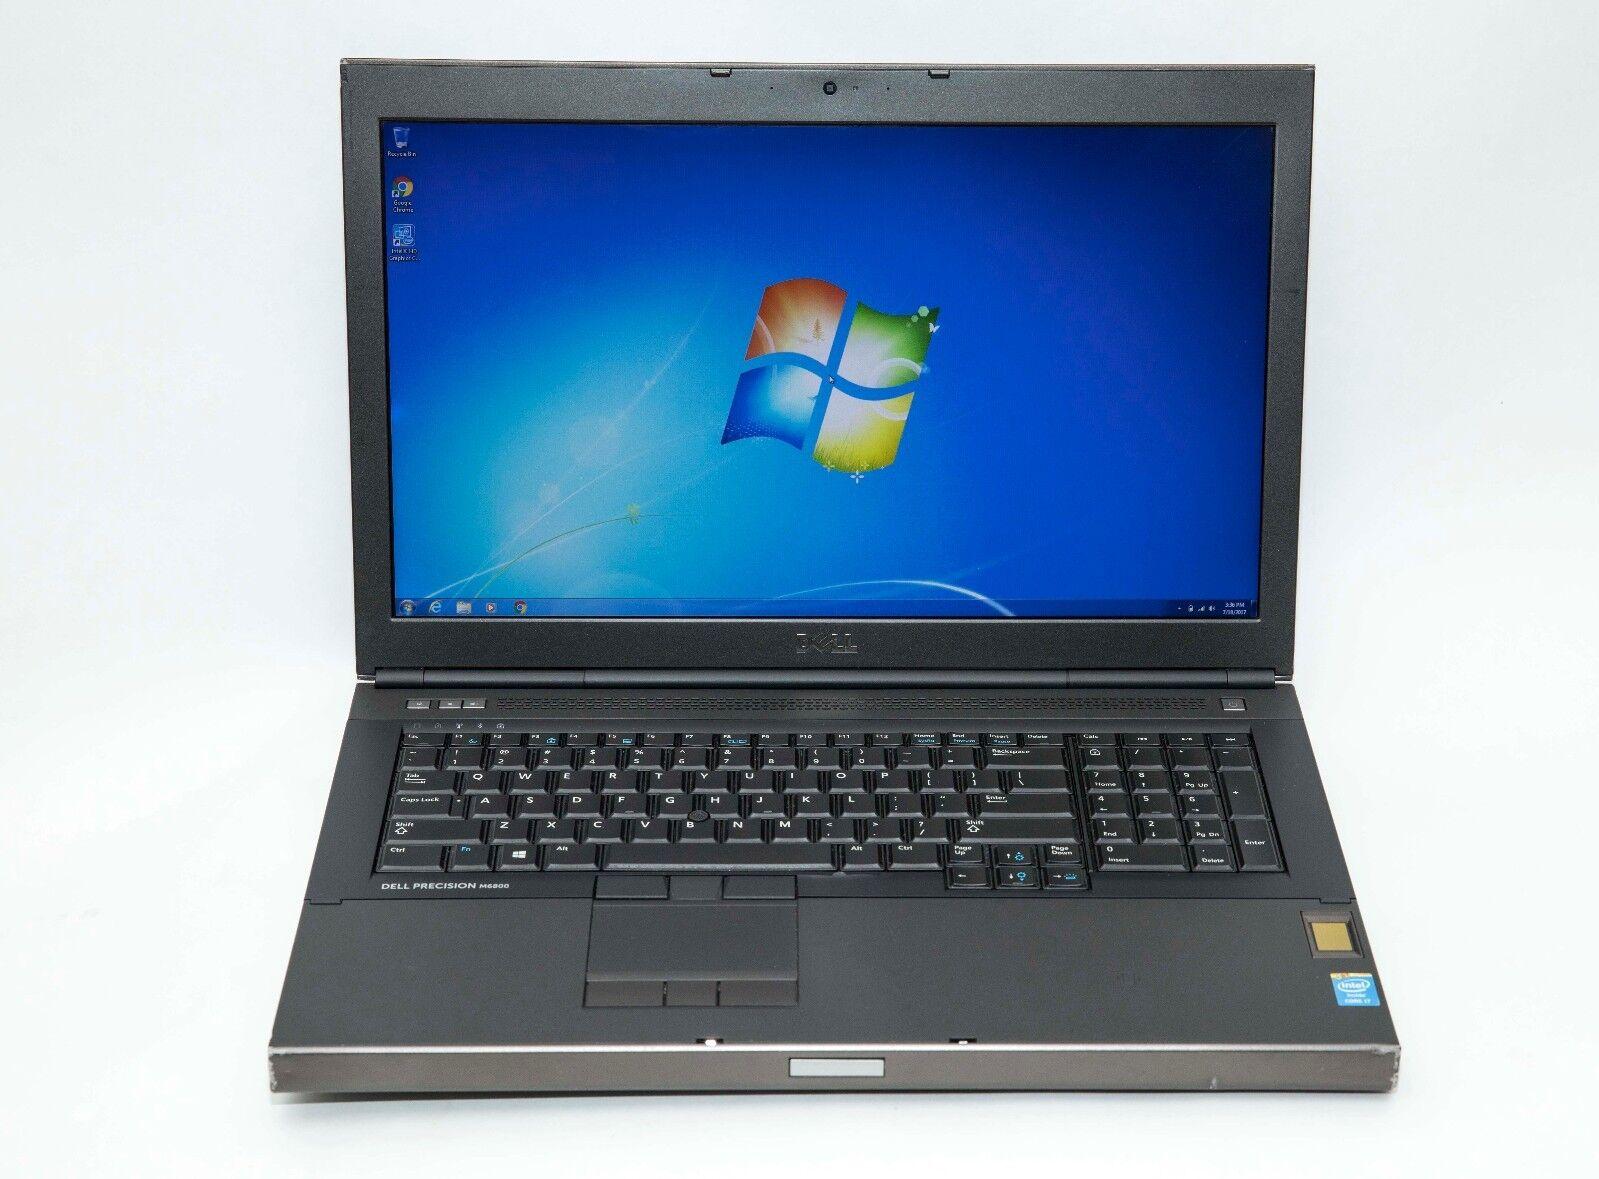 "Dell Precision M6800 17"" i7-4800MQ 2.7GHz 16GB 512GB SSD NVdia 4GB Gaming Laptop"